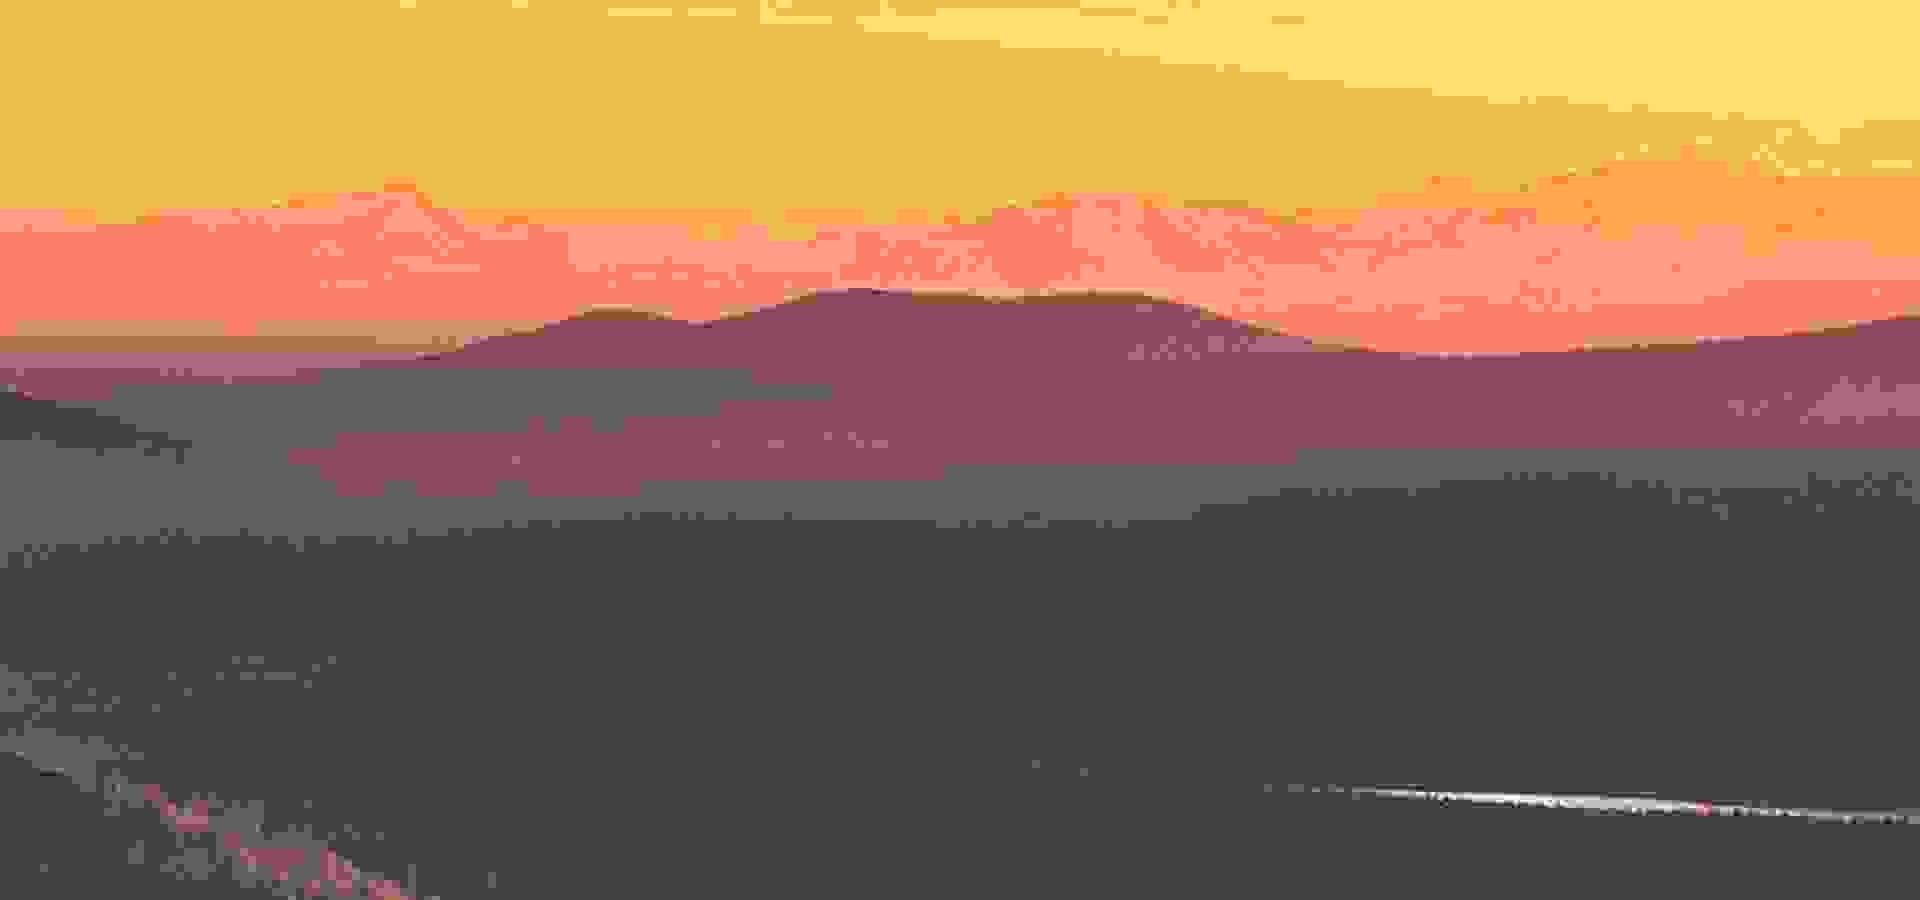 midnattssol, midnattsljus, foto: david björkén destination jokkmokk, 1280 x 1638